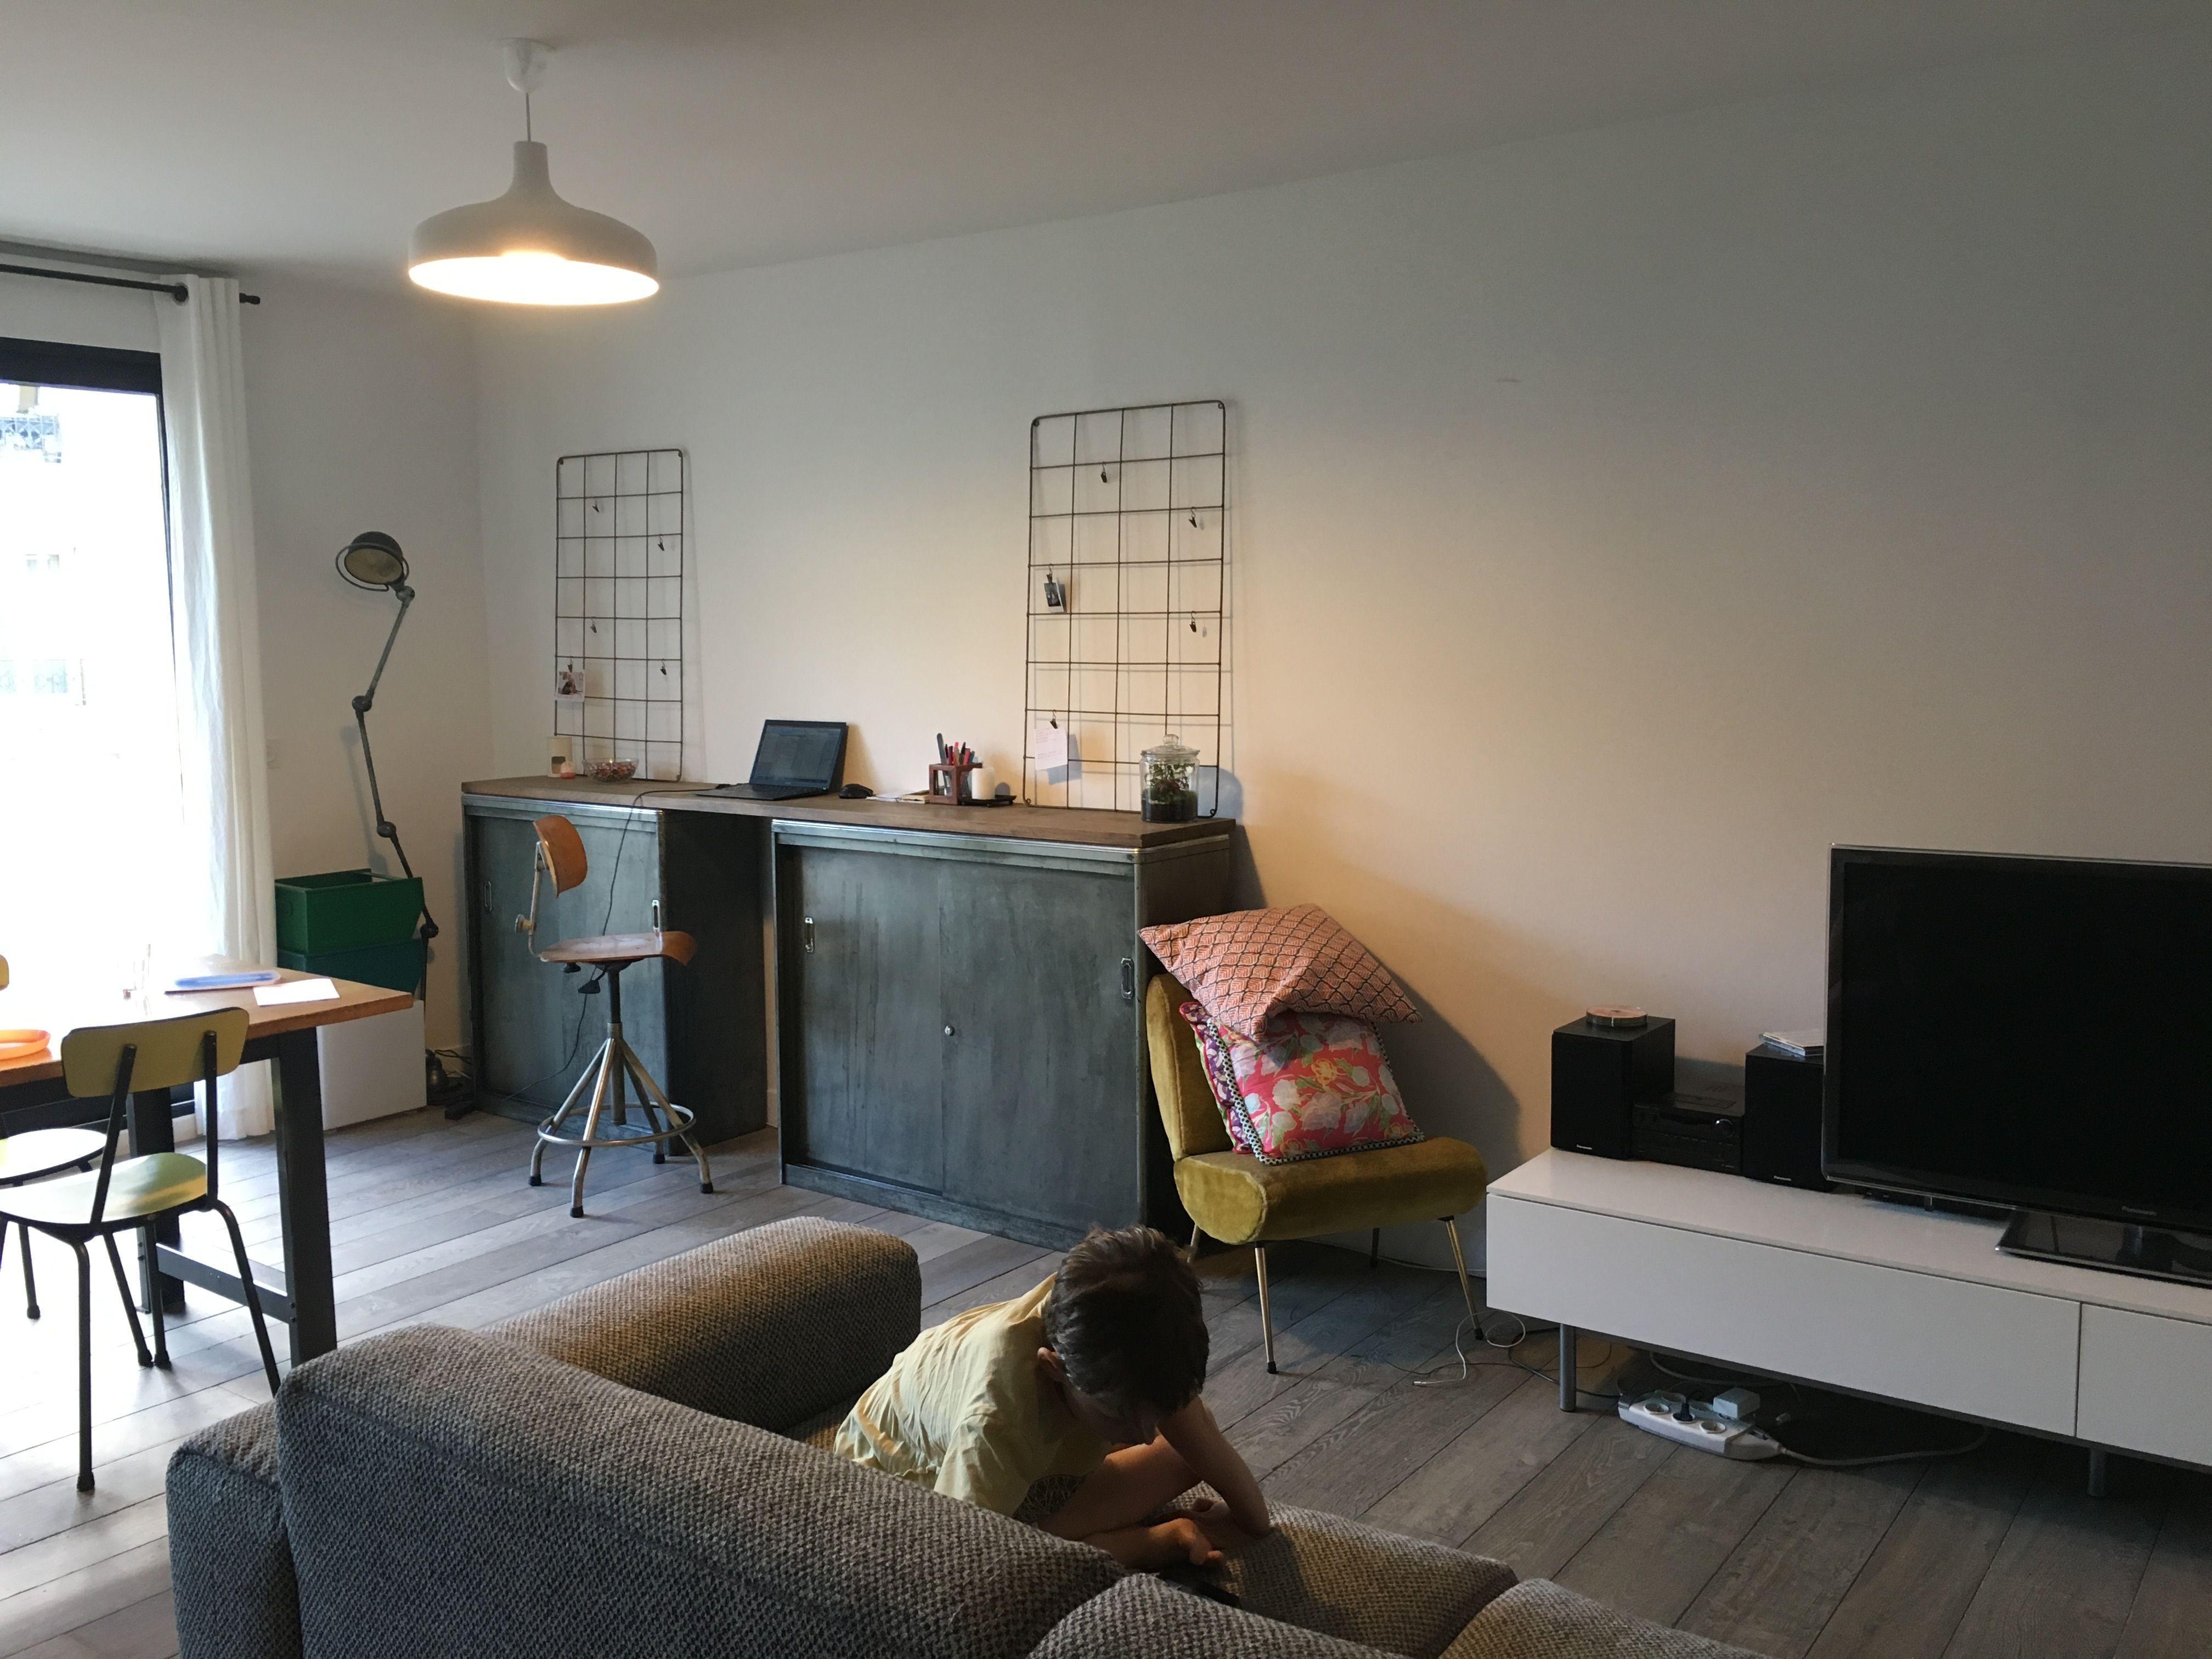 salon industriel meubles photos de brocante grilles bureau canap habitat meuble tv - Meuble Tv Jaune Ikea